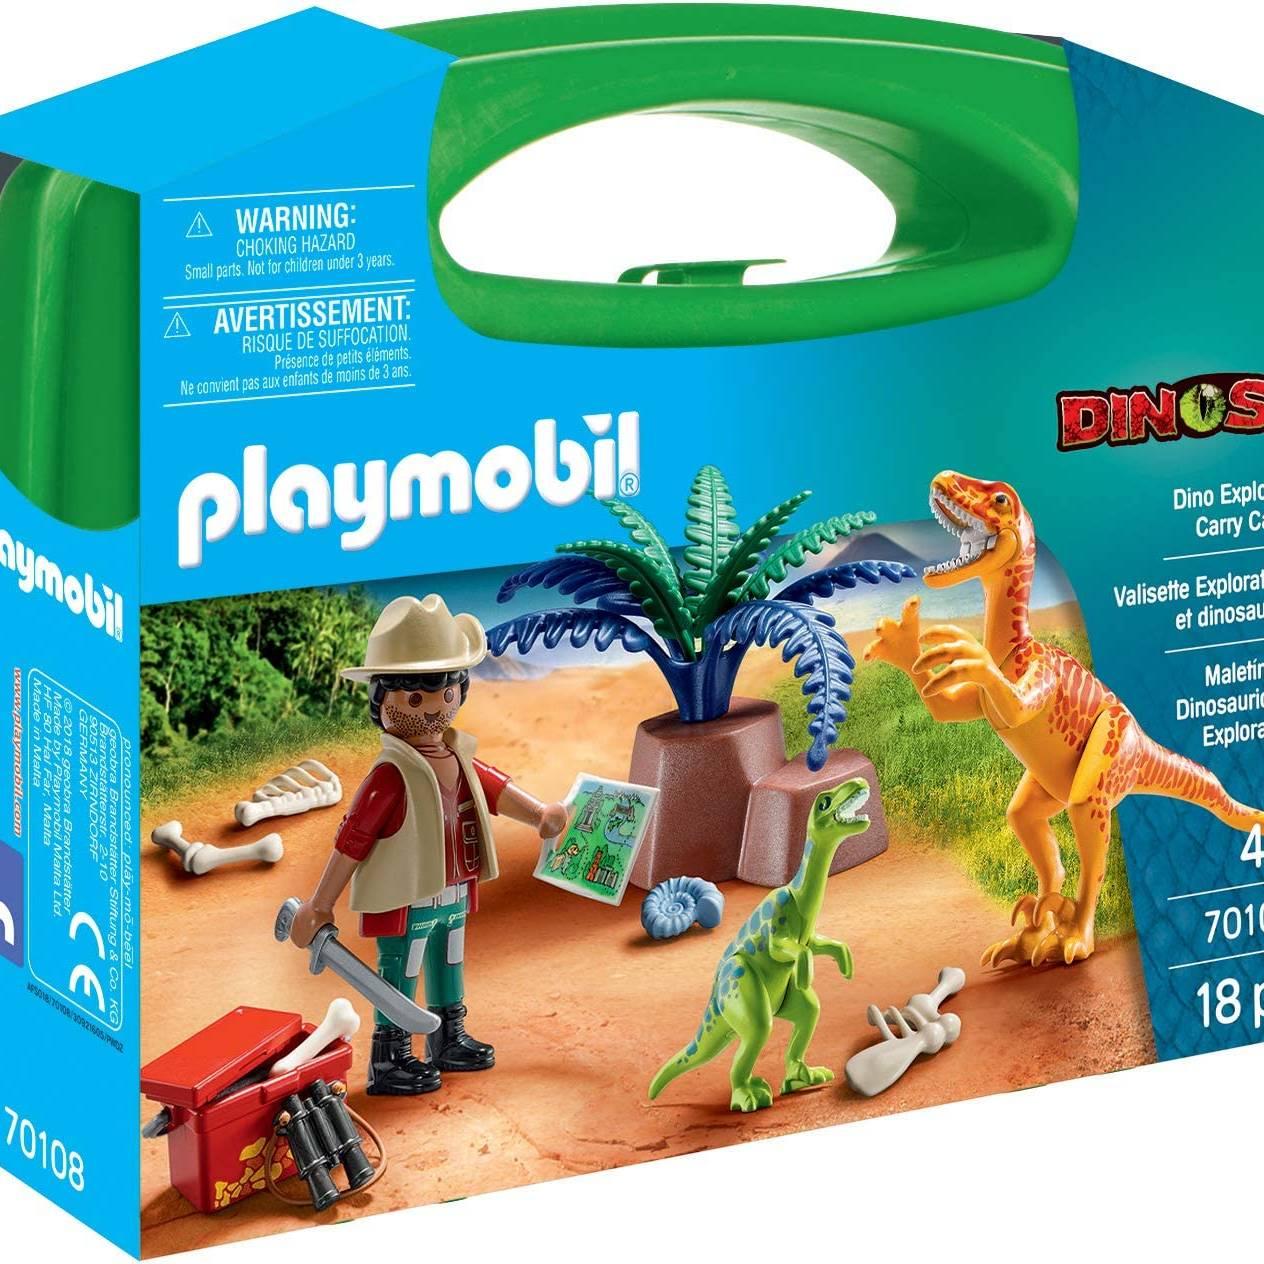 Playmobil 70108 Large Dino Explorer Carry Case